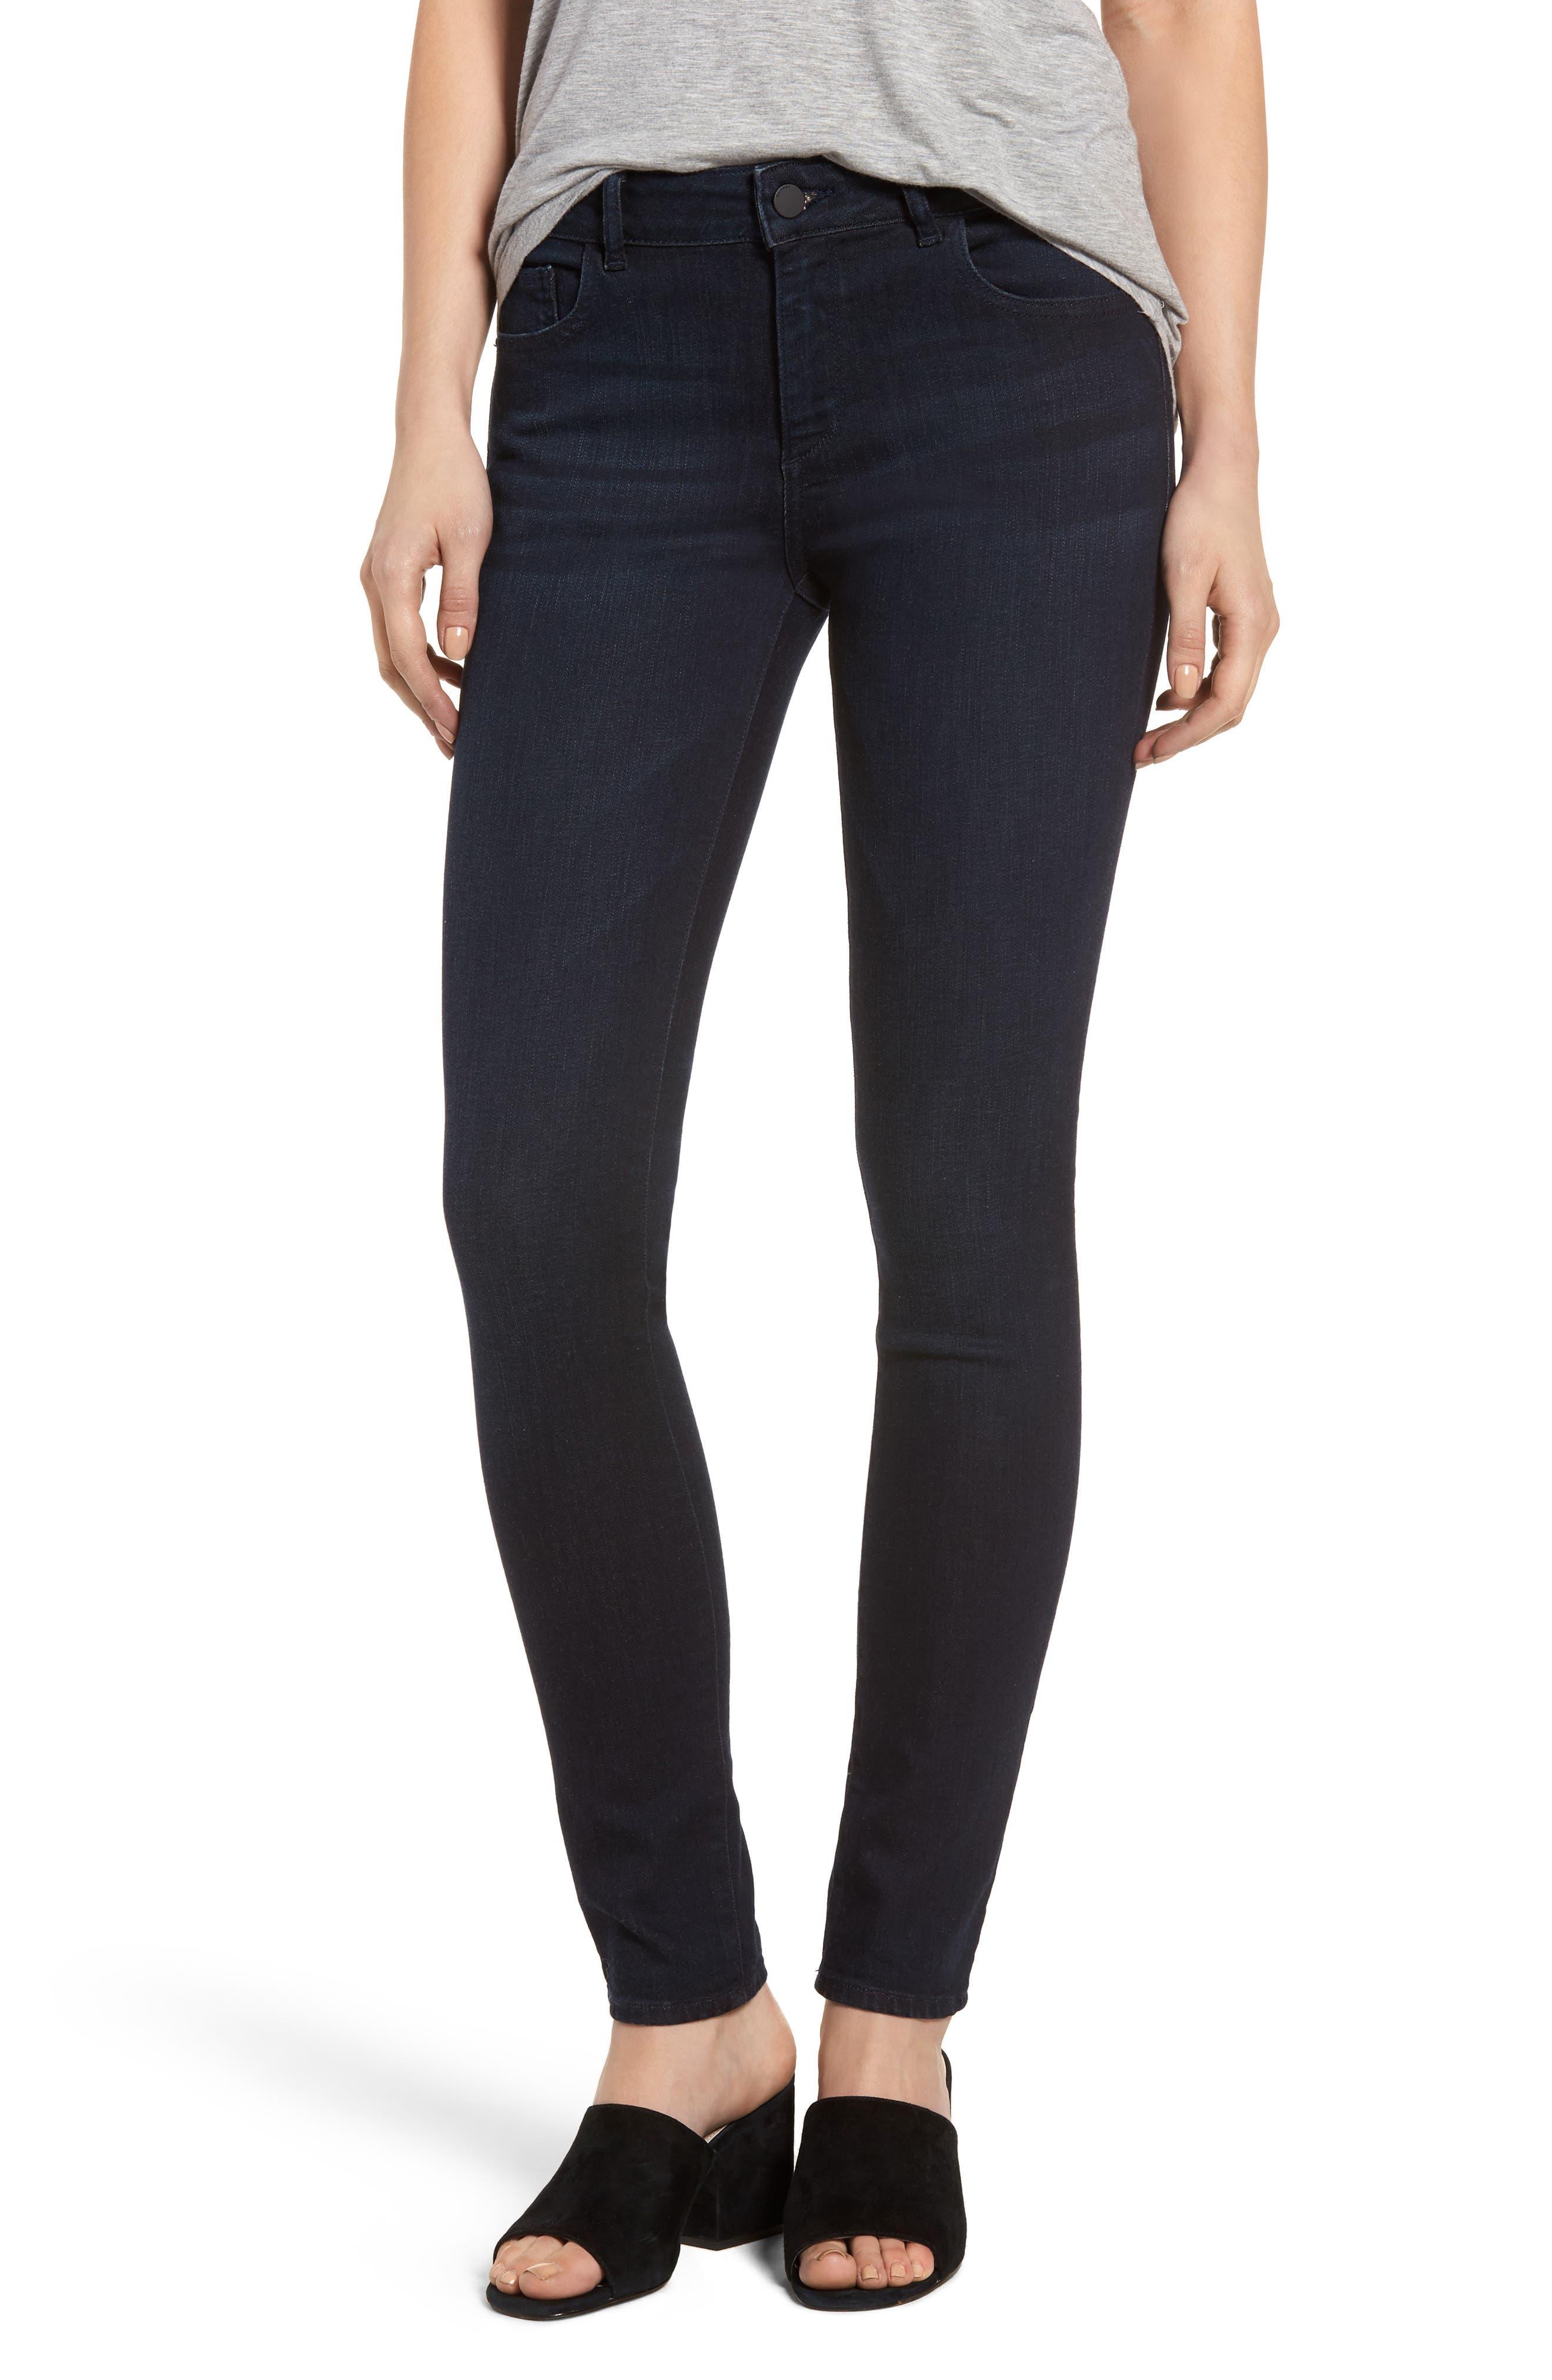 Alternate Image 1 Selected - DL1961 Florence Instasculpt Skinny Jeans (Carley)